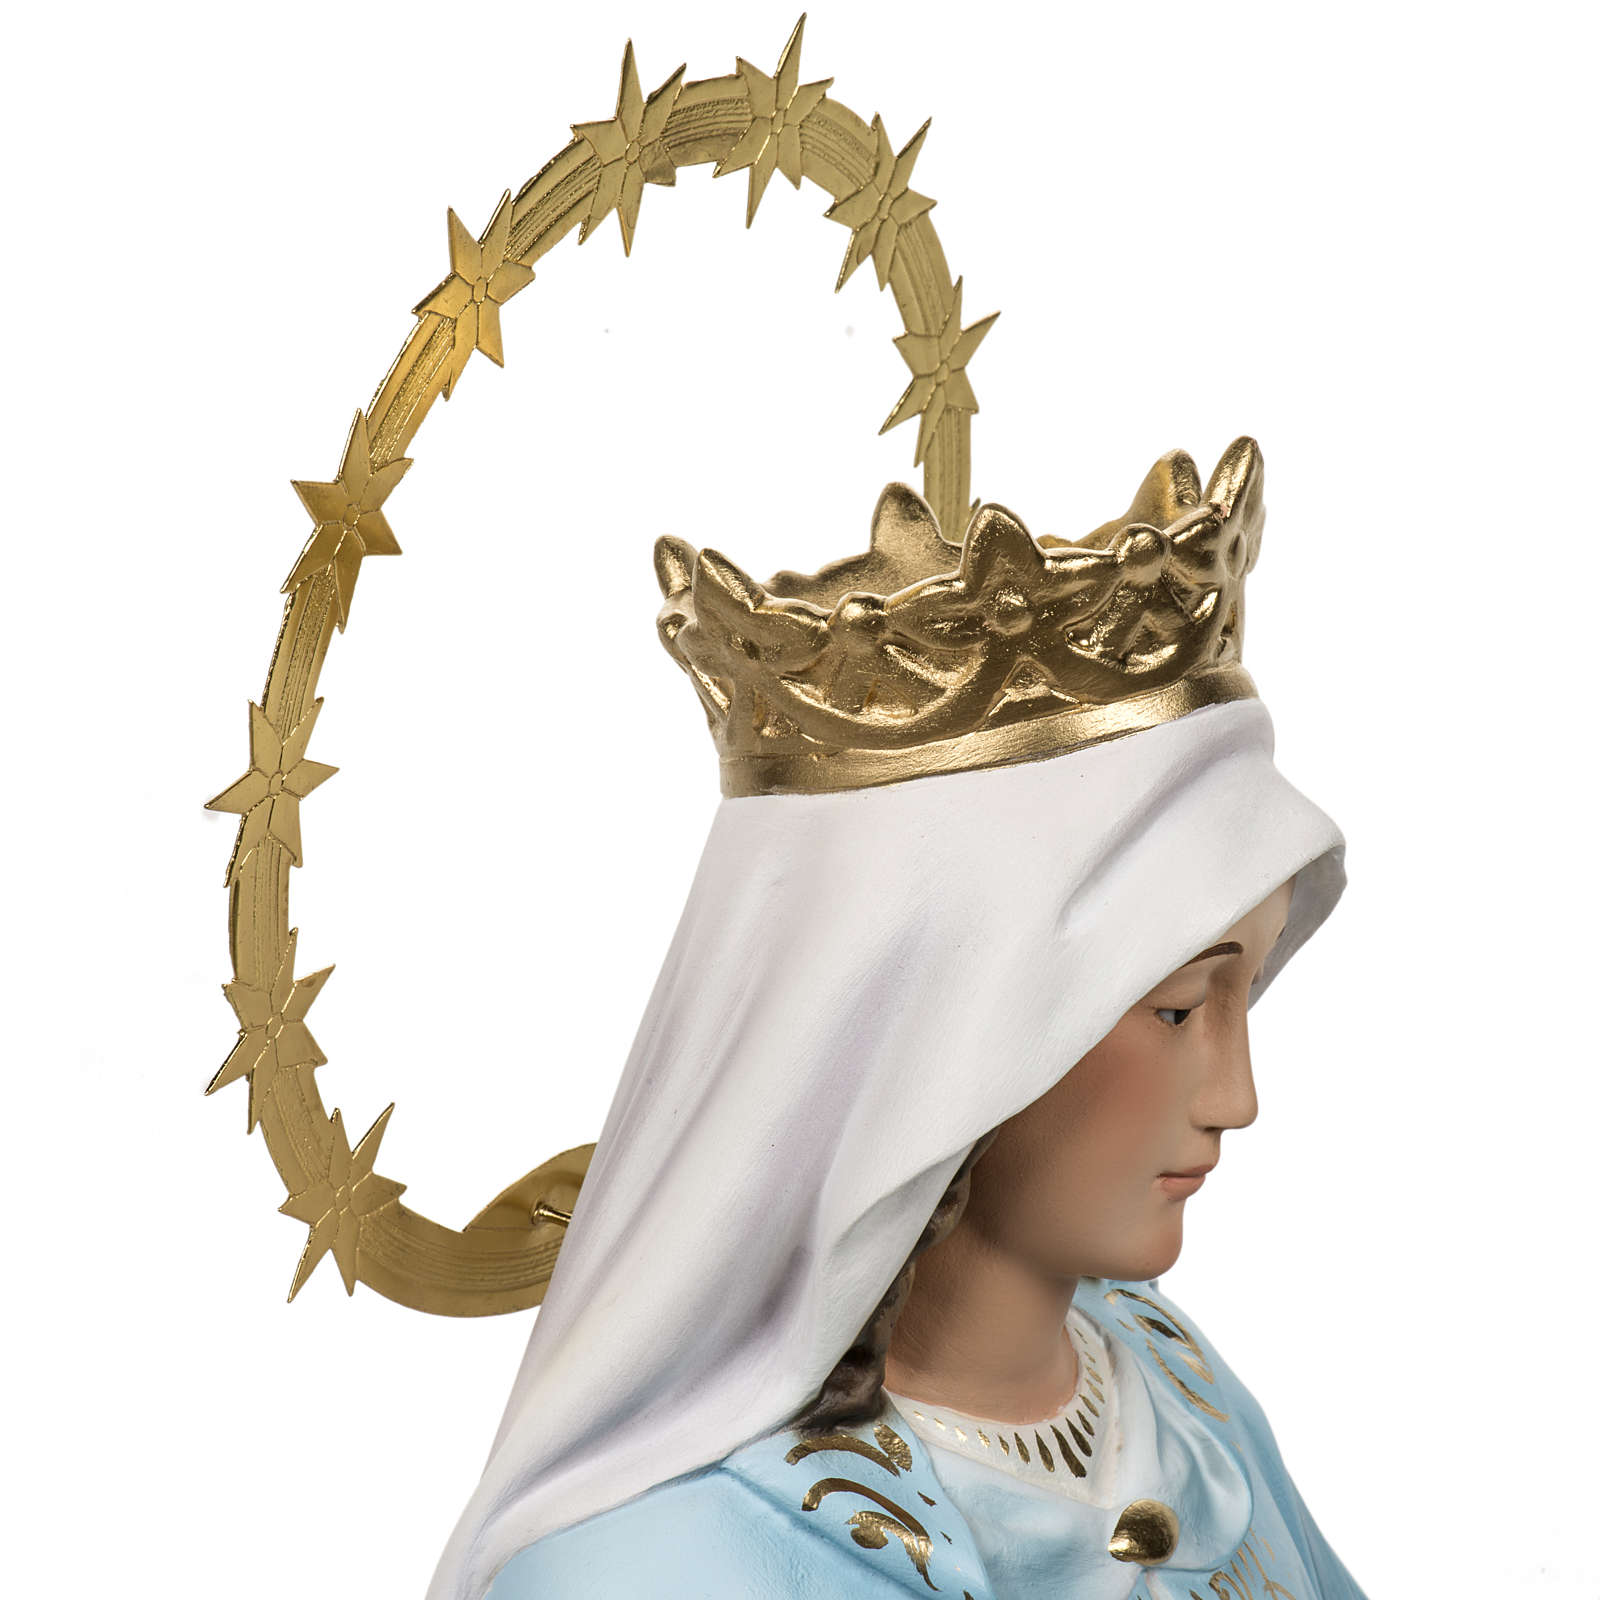 Miraculous Madonna statue 60cm in wood paste, elegant decoration 4